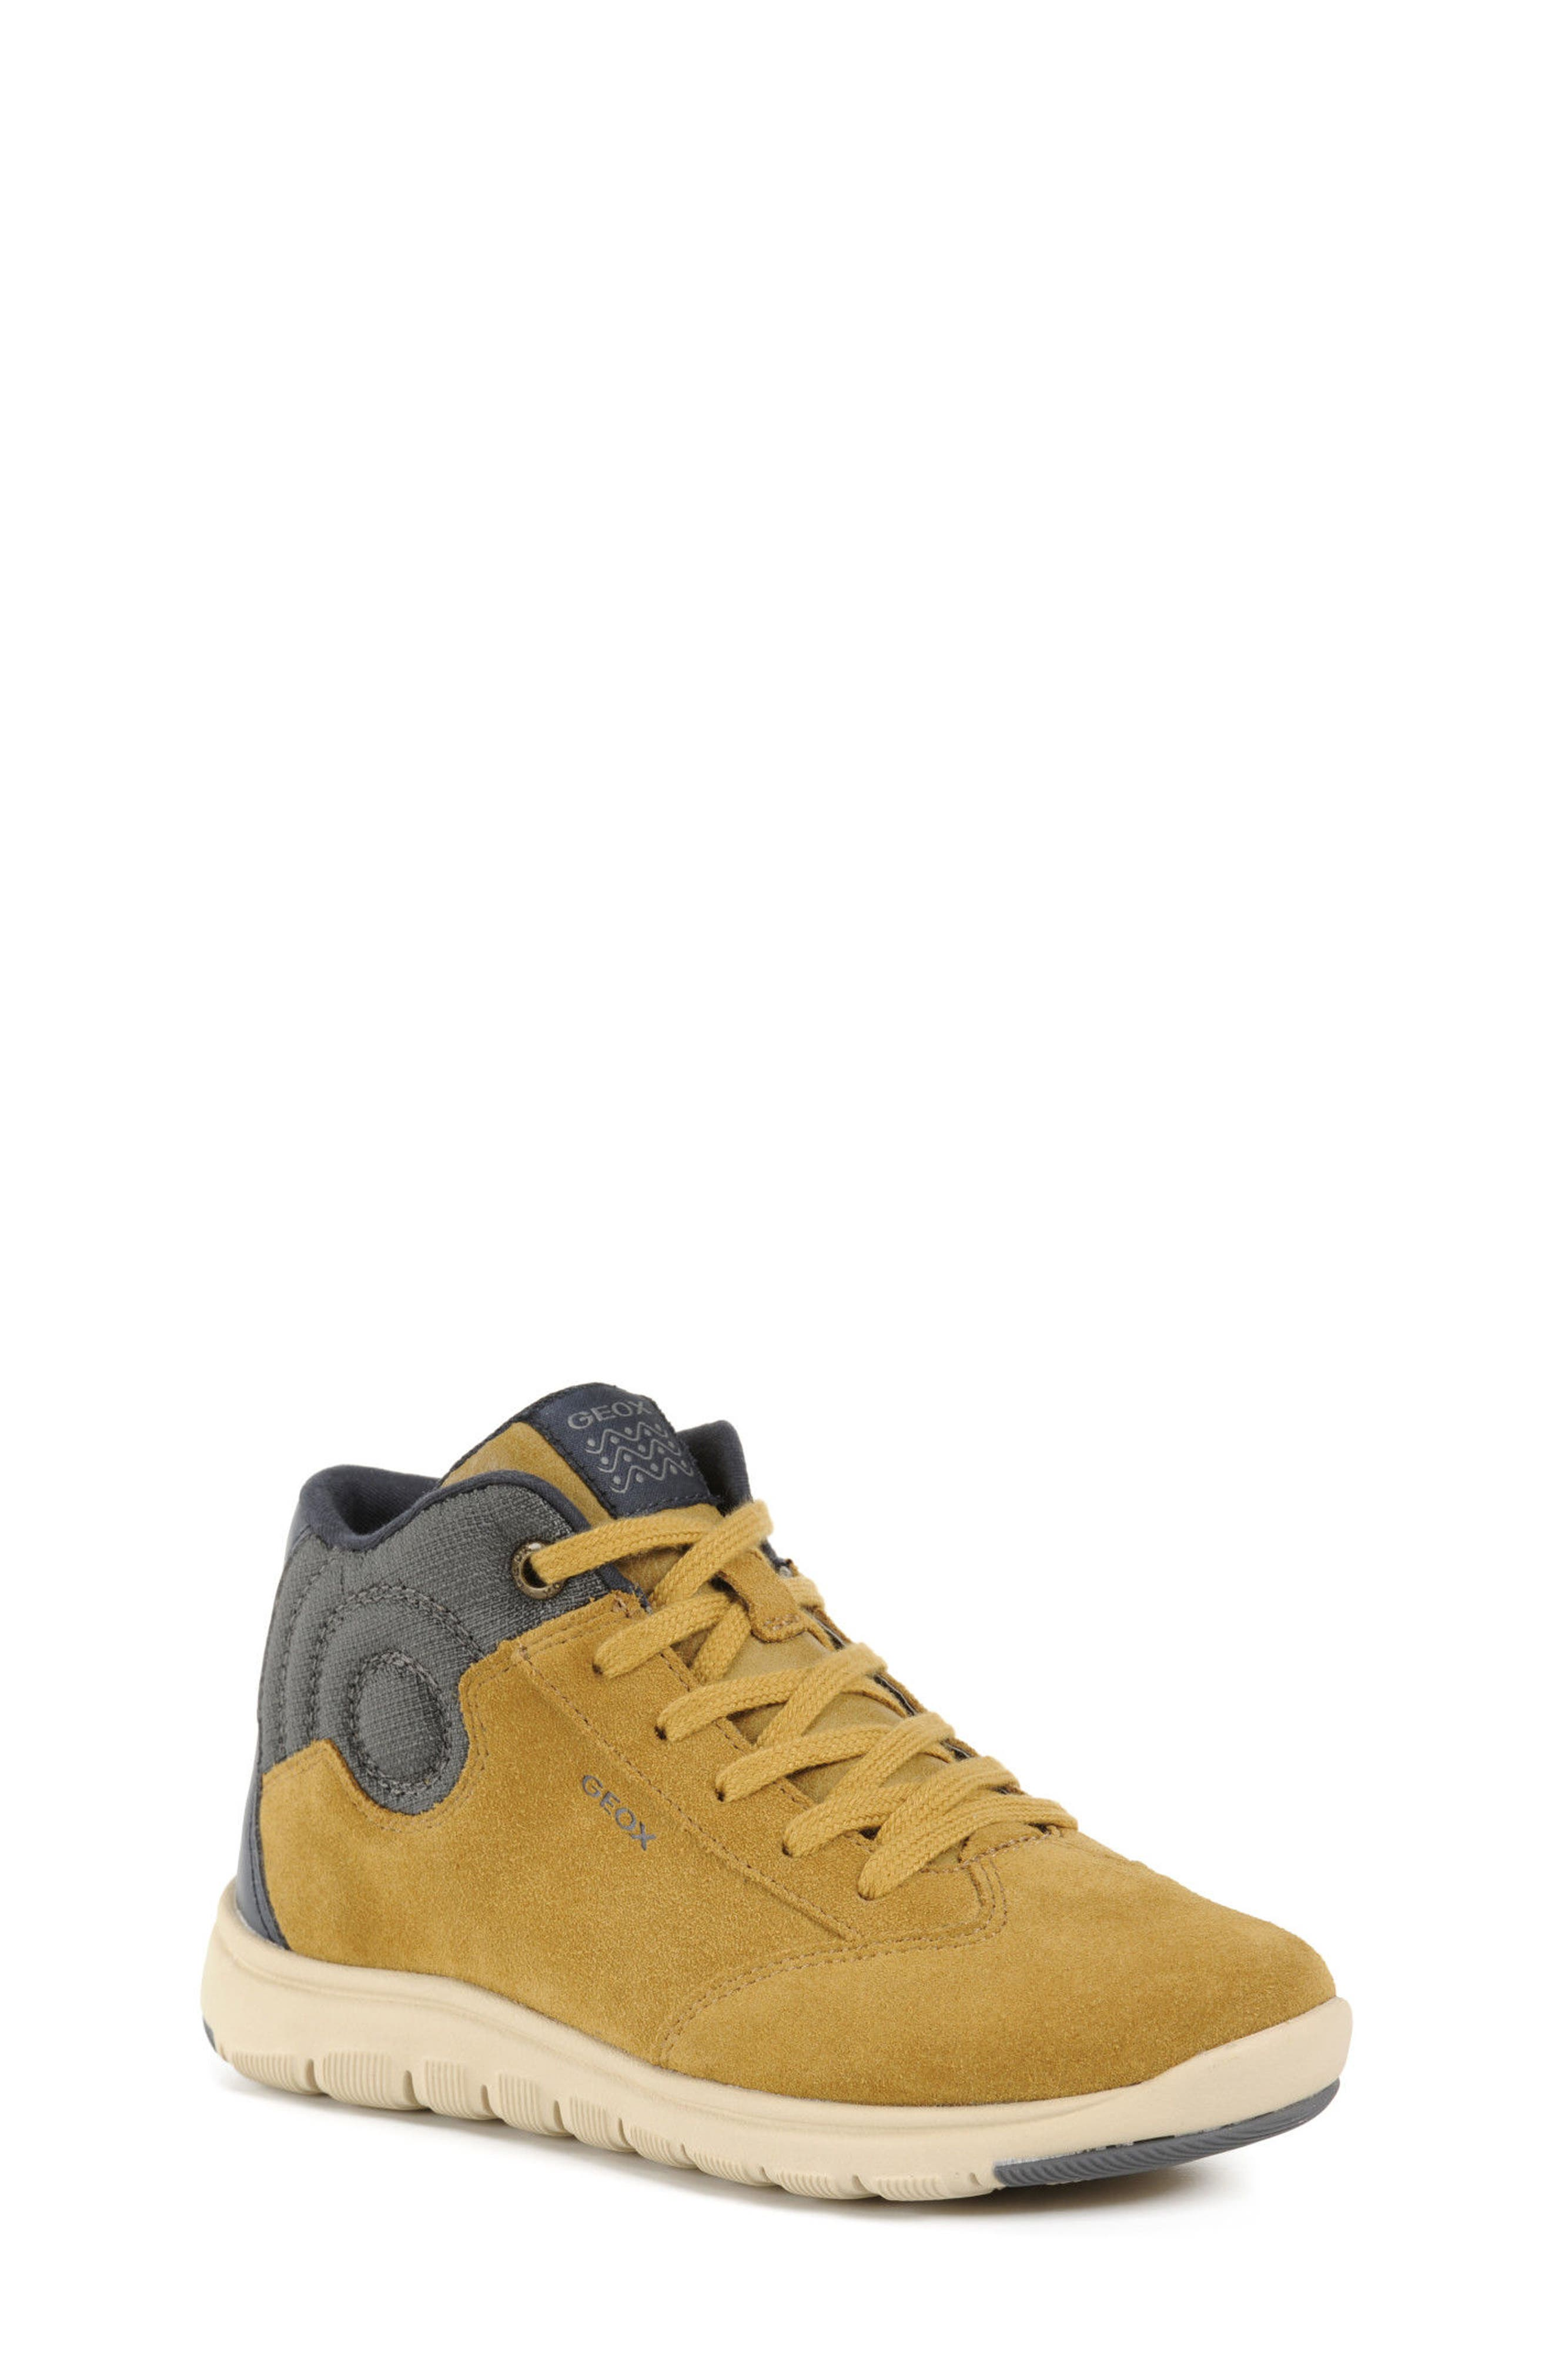 Xunday Mid Top Sneaker,                             Main thumbnail 1, color,                             020